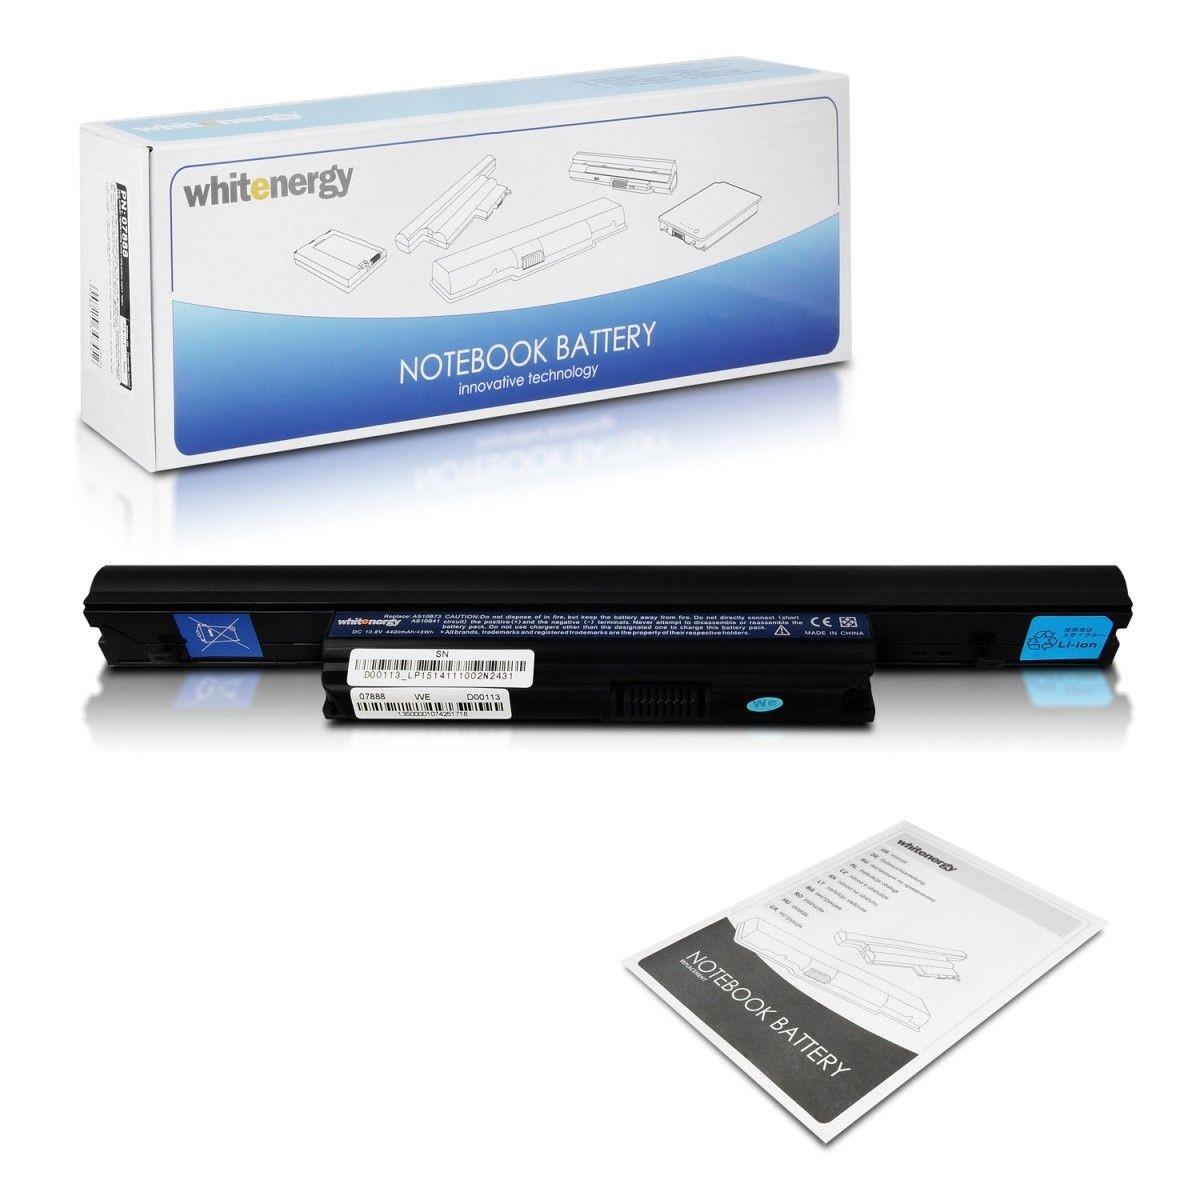 Whitenergy bateria Acer Aspire 5625G (11.1V, Li-Ion, 4400mAh)